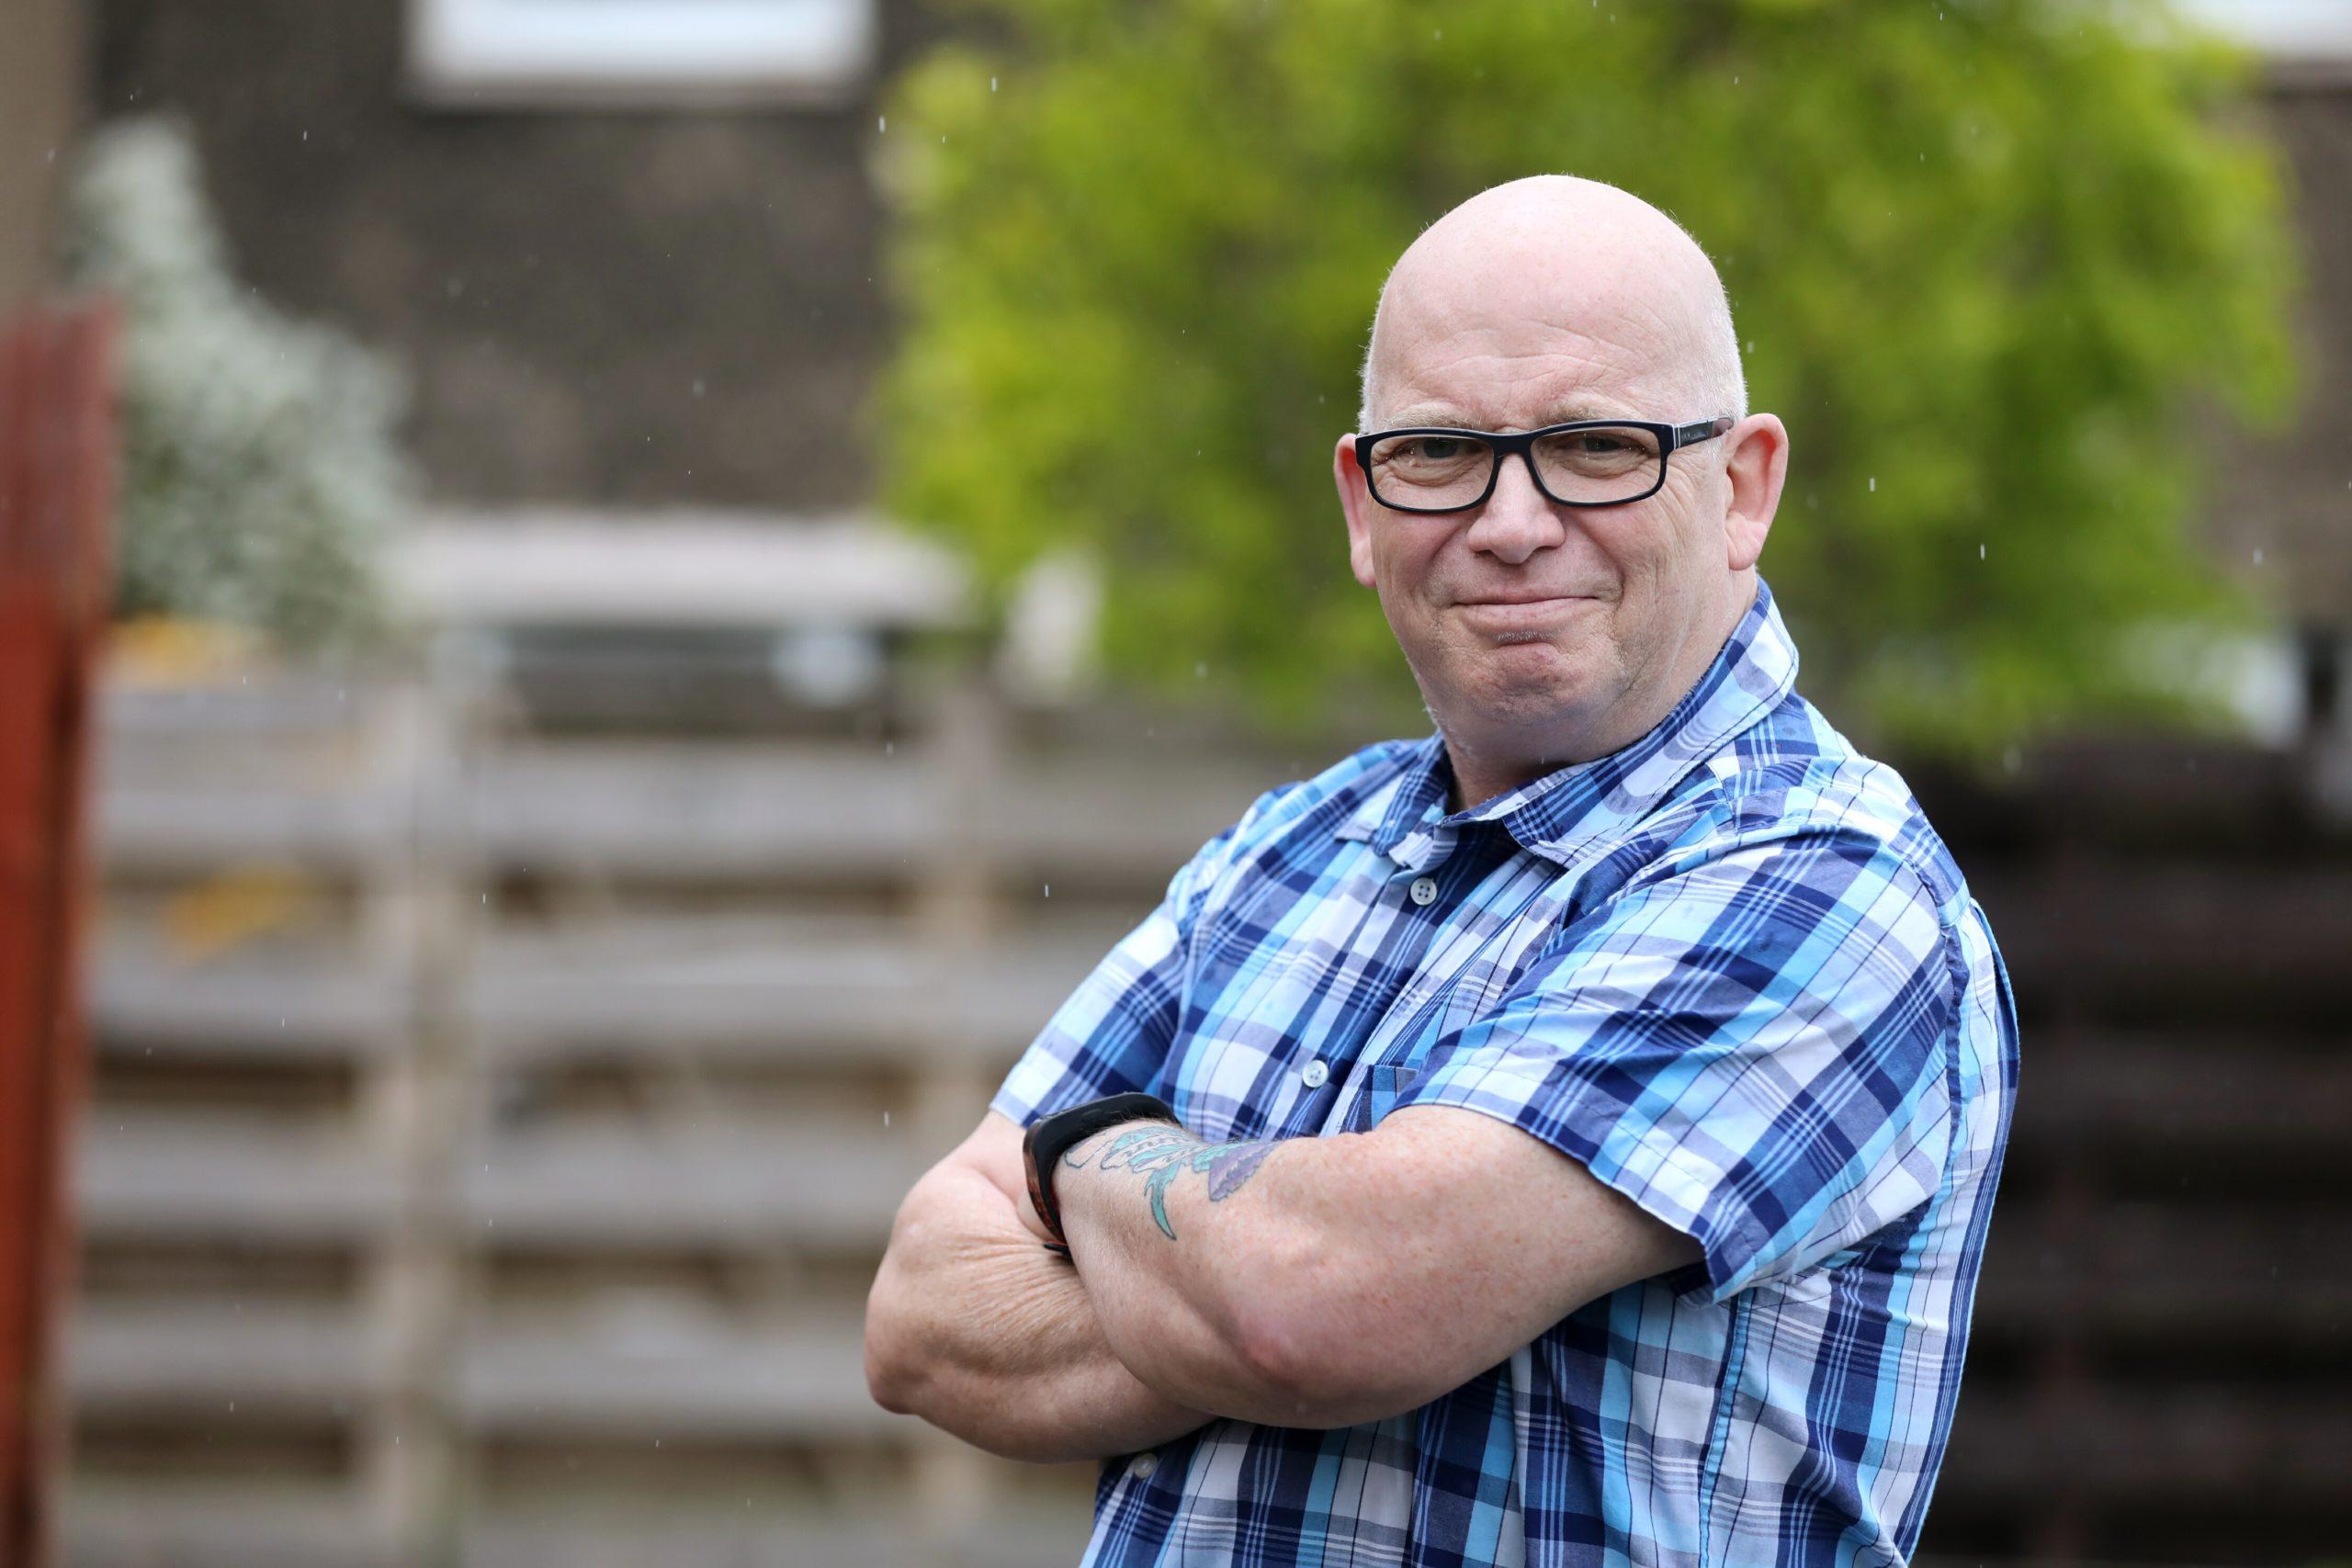 Alan Smith's life was saved by Steven Kemlo and David McNaught